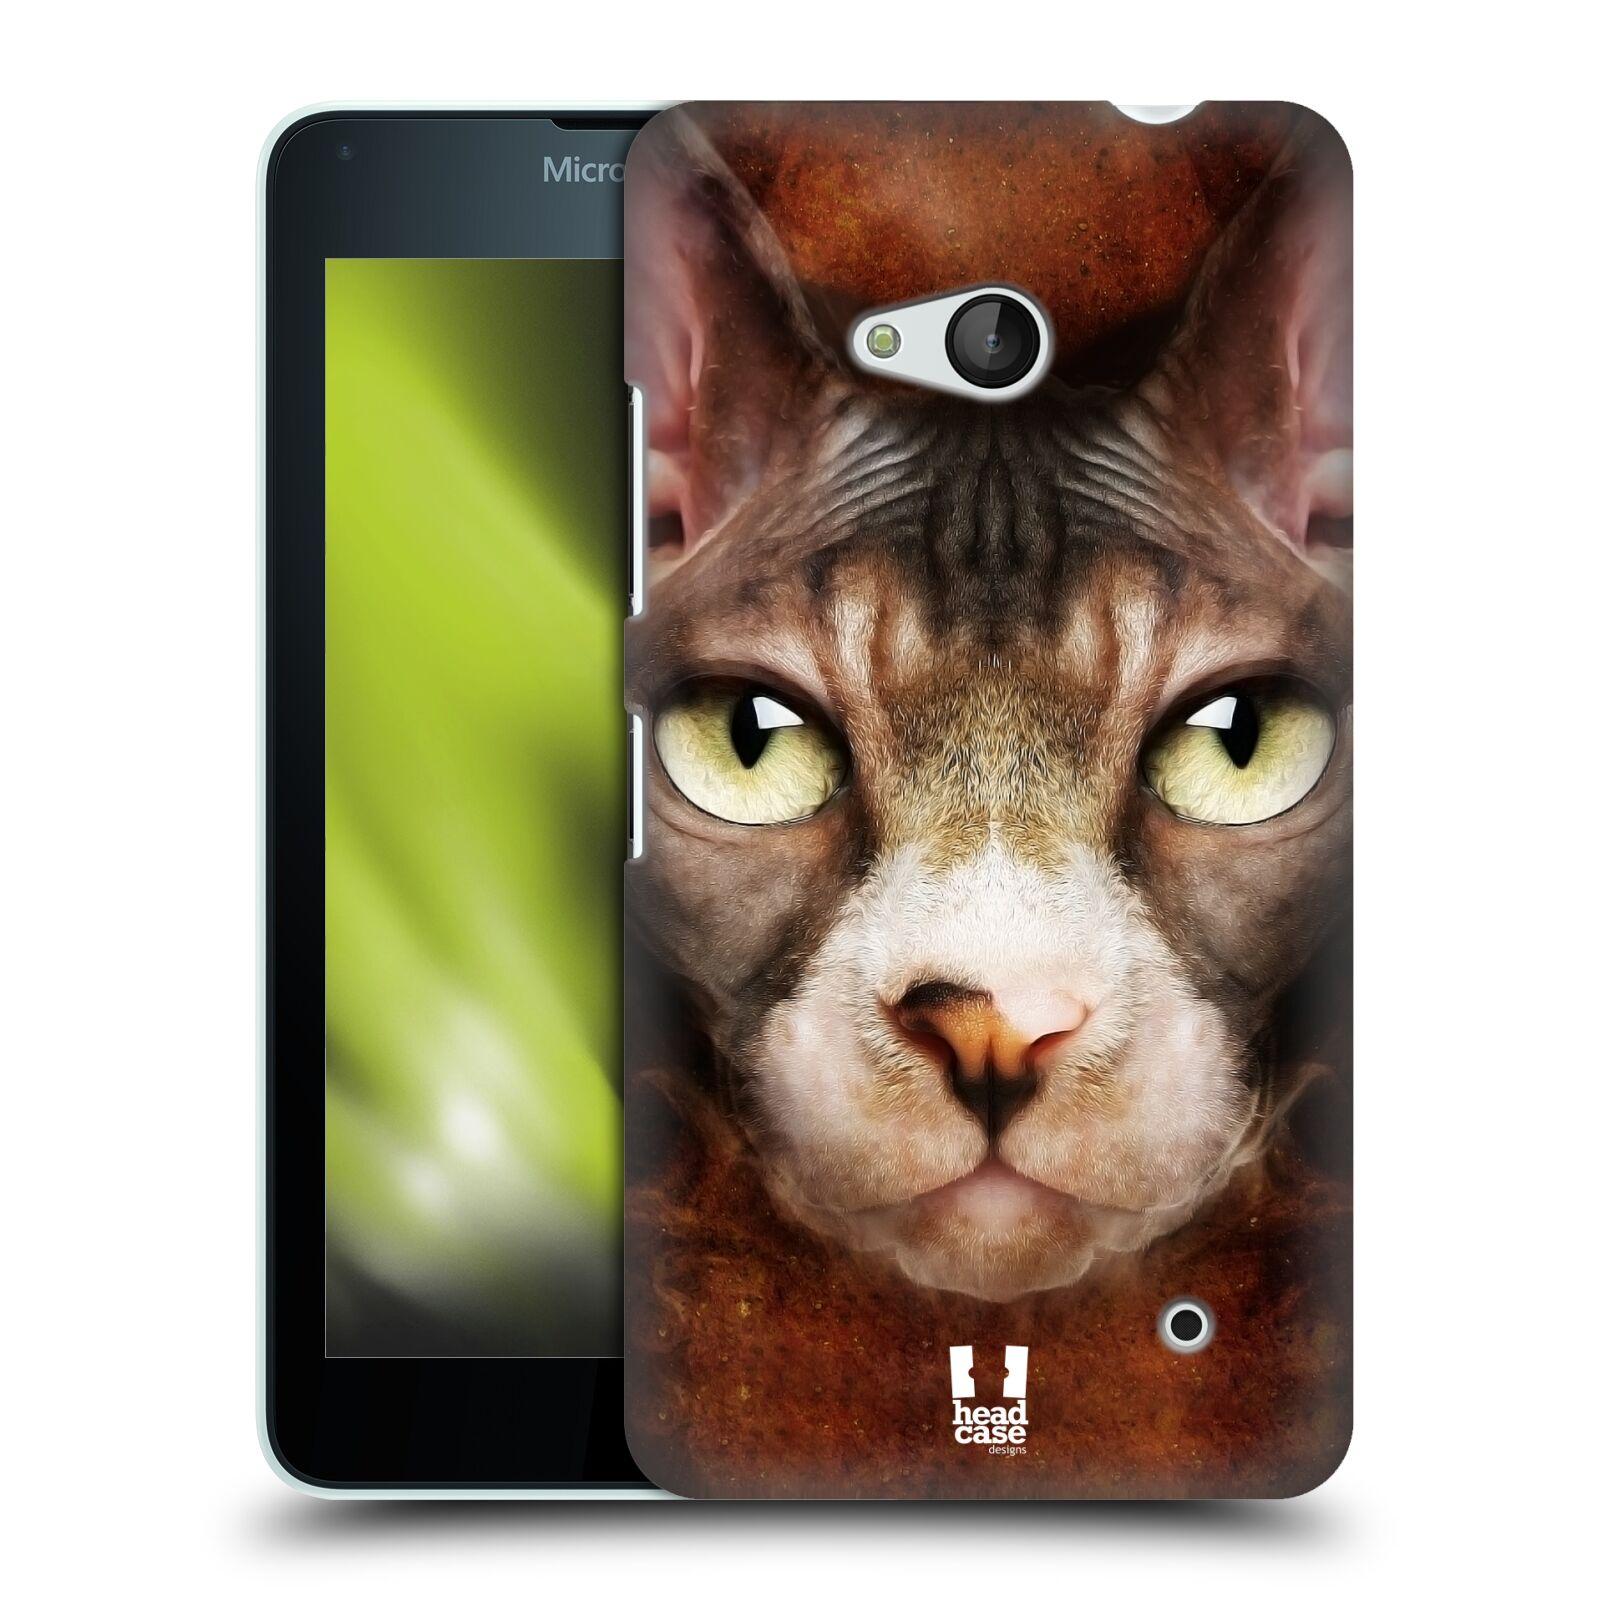 HEAD CASE plastový obal na mobil Nokia Lumia 640 vzor Zvířecí tváře kočka sphynx